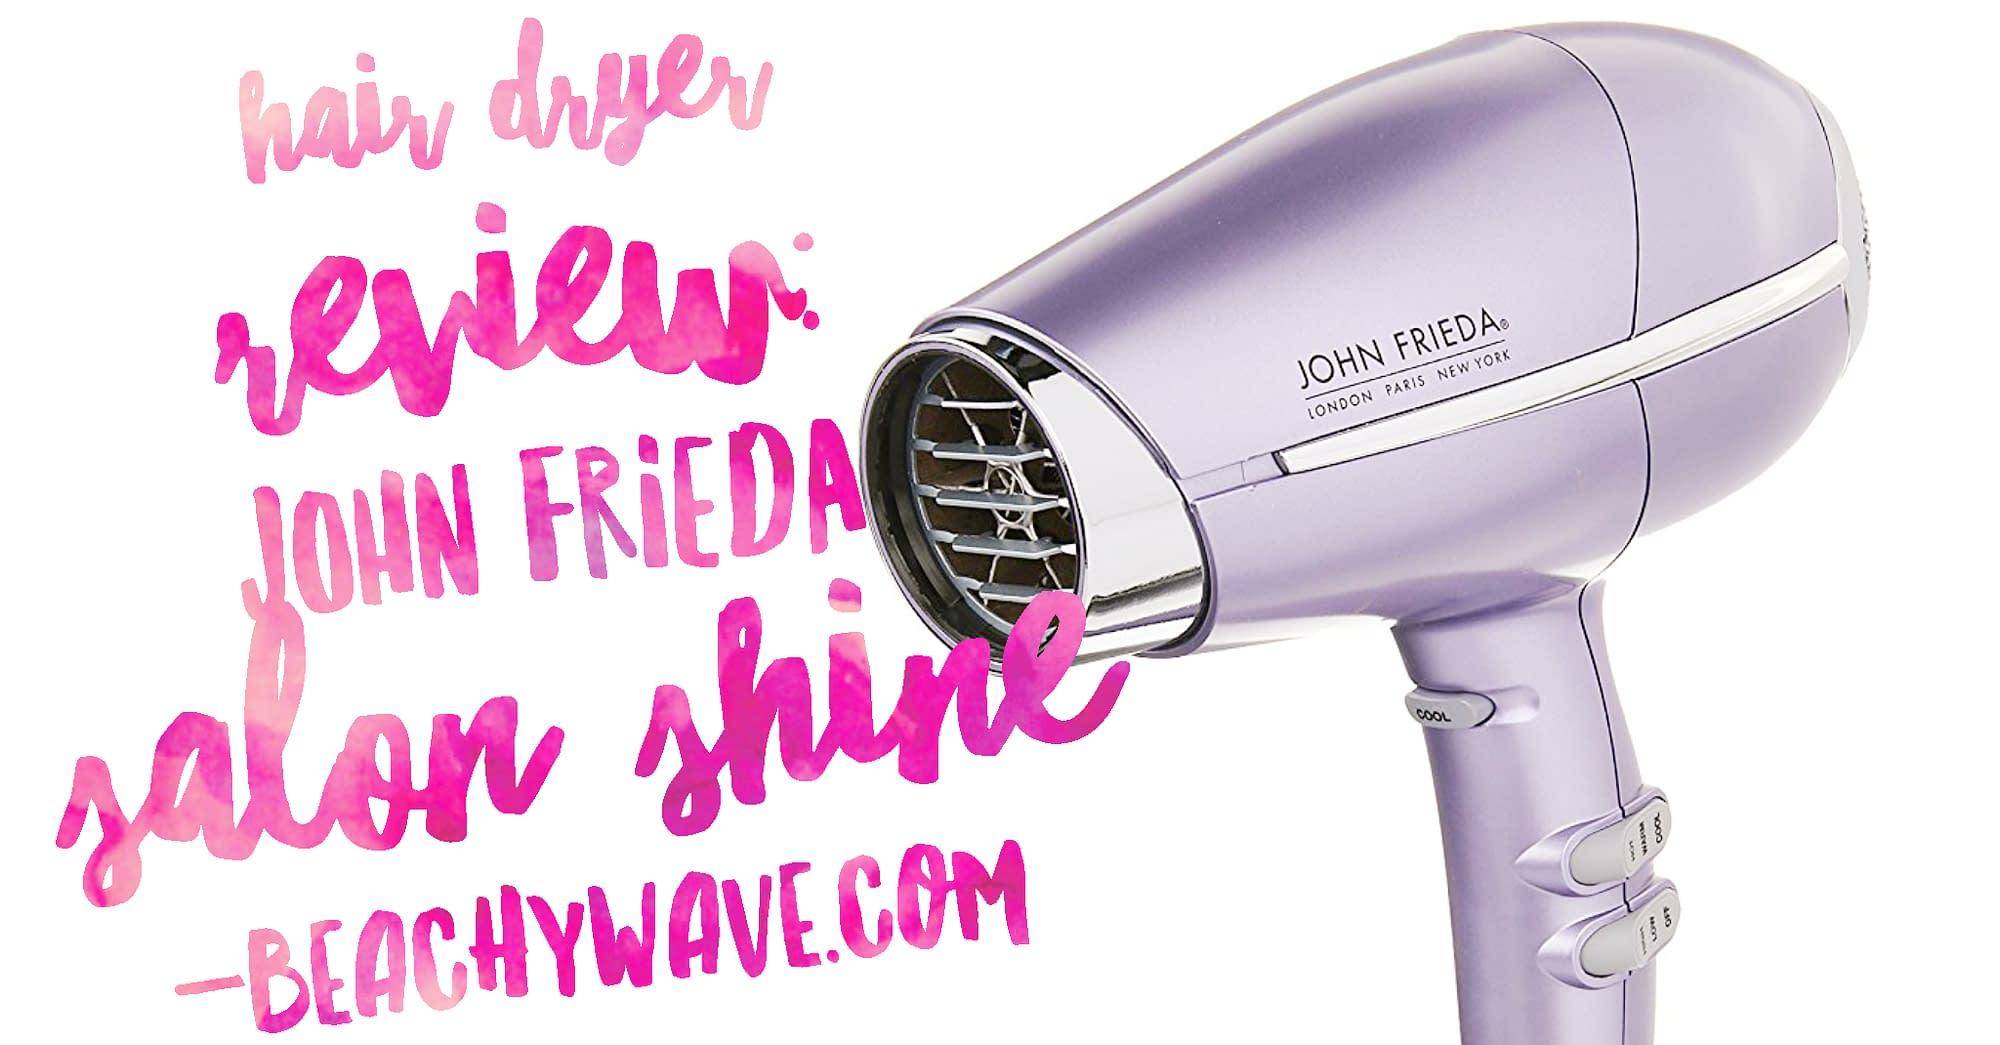 Hair Dryer Review: John Frieda Salon Shine